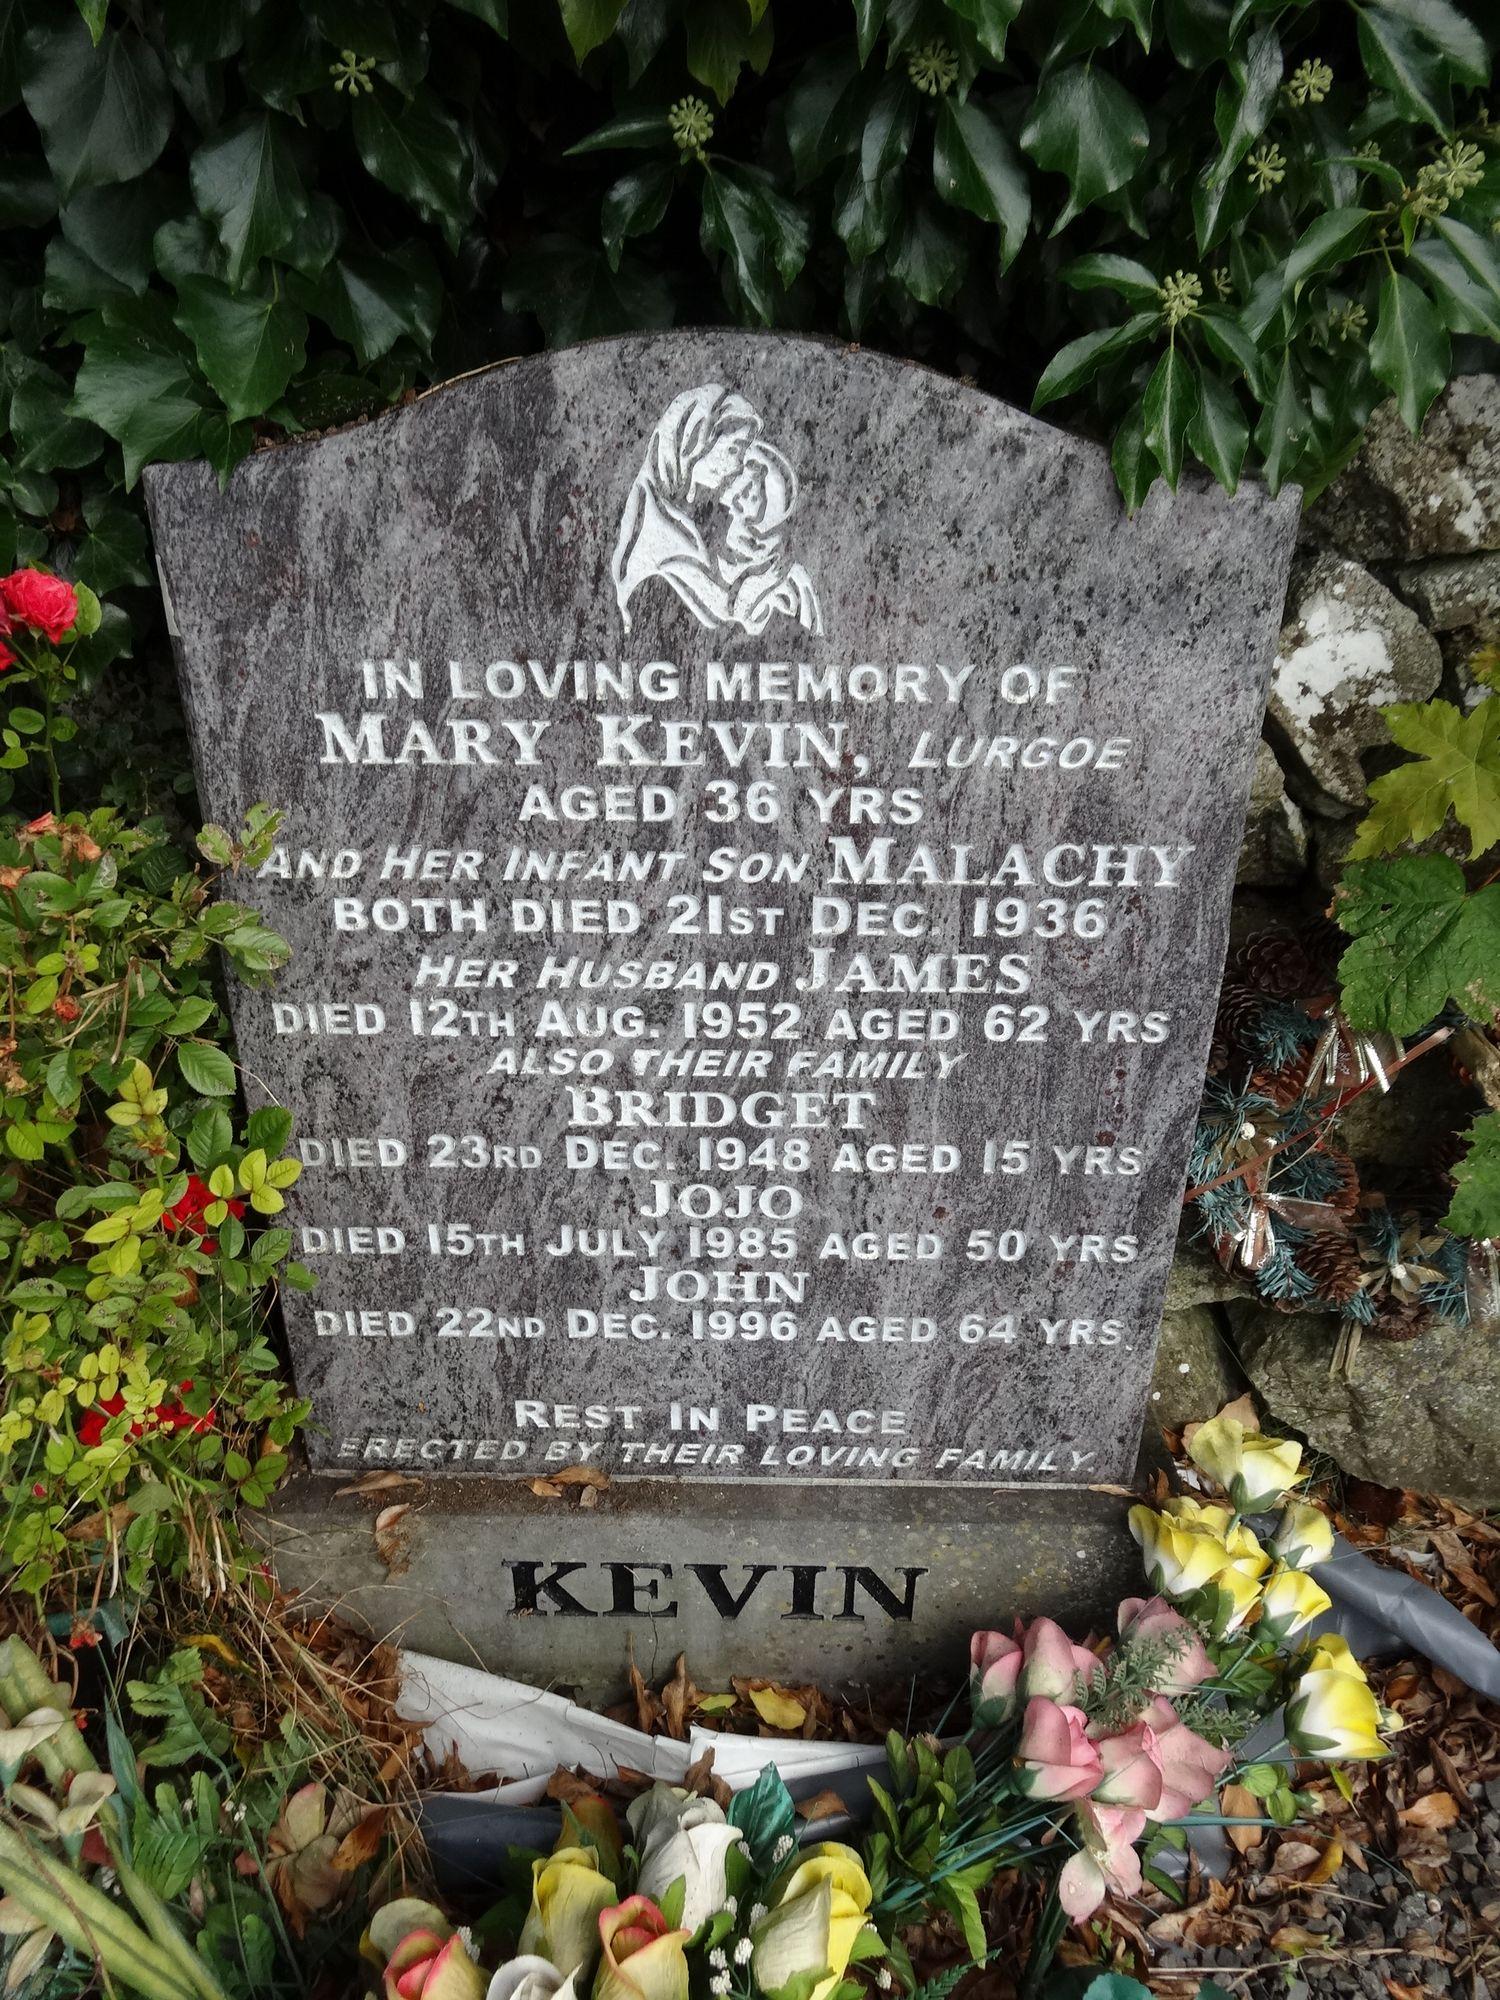 TS-BLNR-0114 | Historic Graves